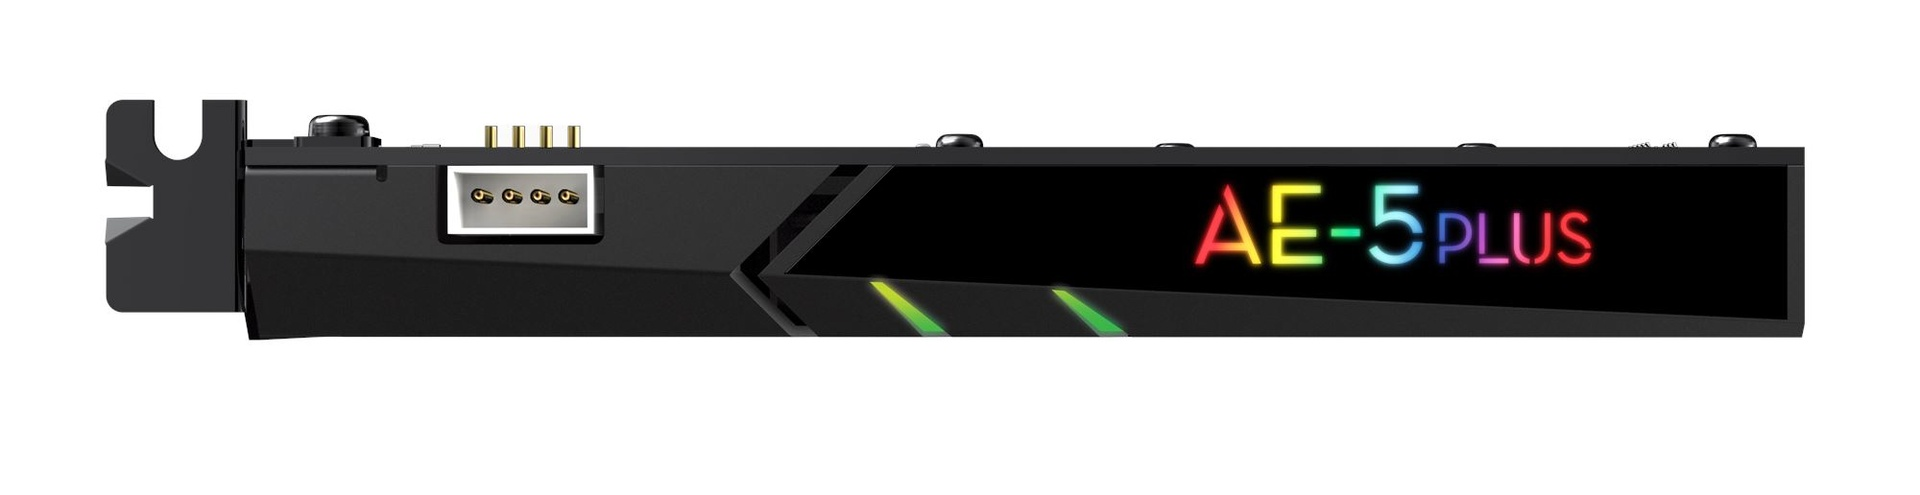 Sound BlasterX AE-5 Plus